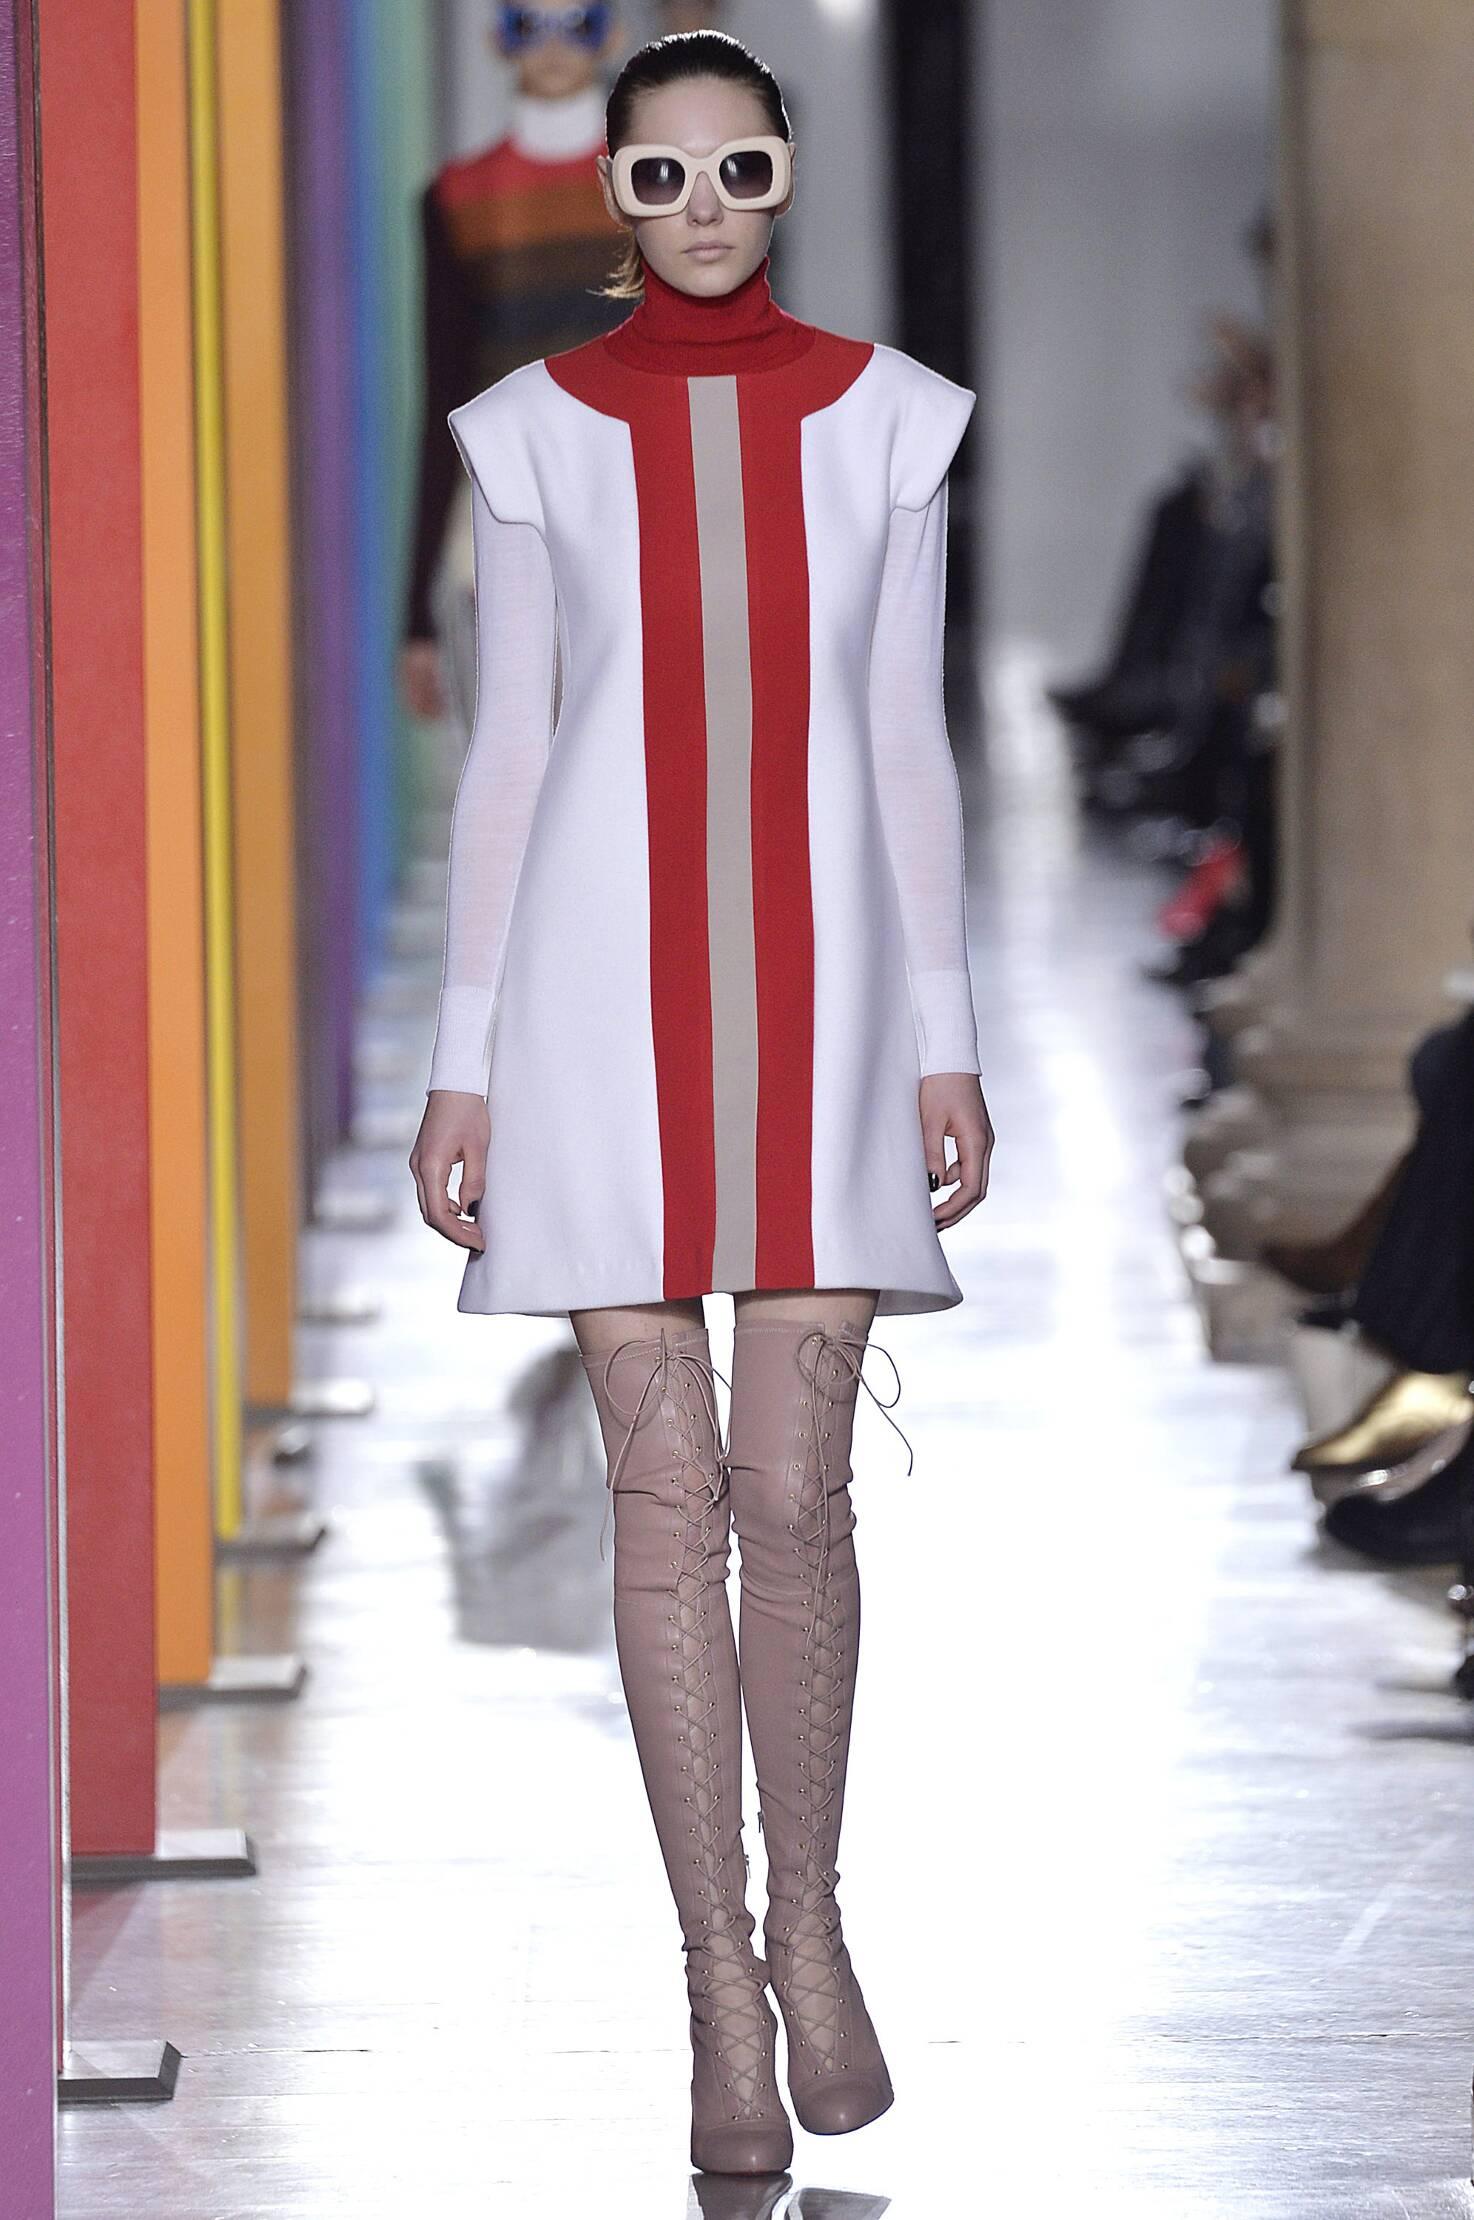 Runway Jonathan Saunders Fall Winter 2015 16 Women's Collection London Fashion Week